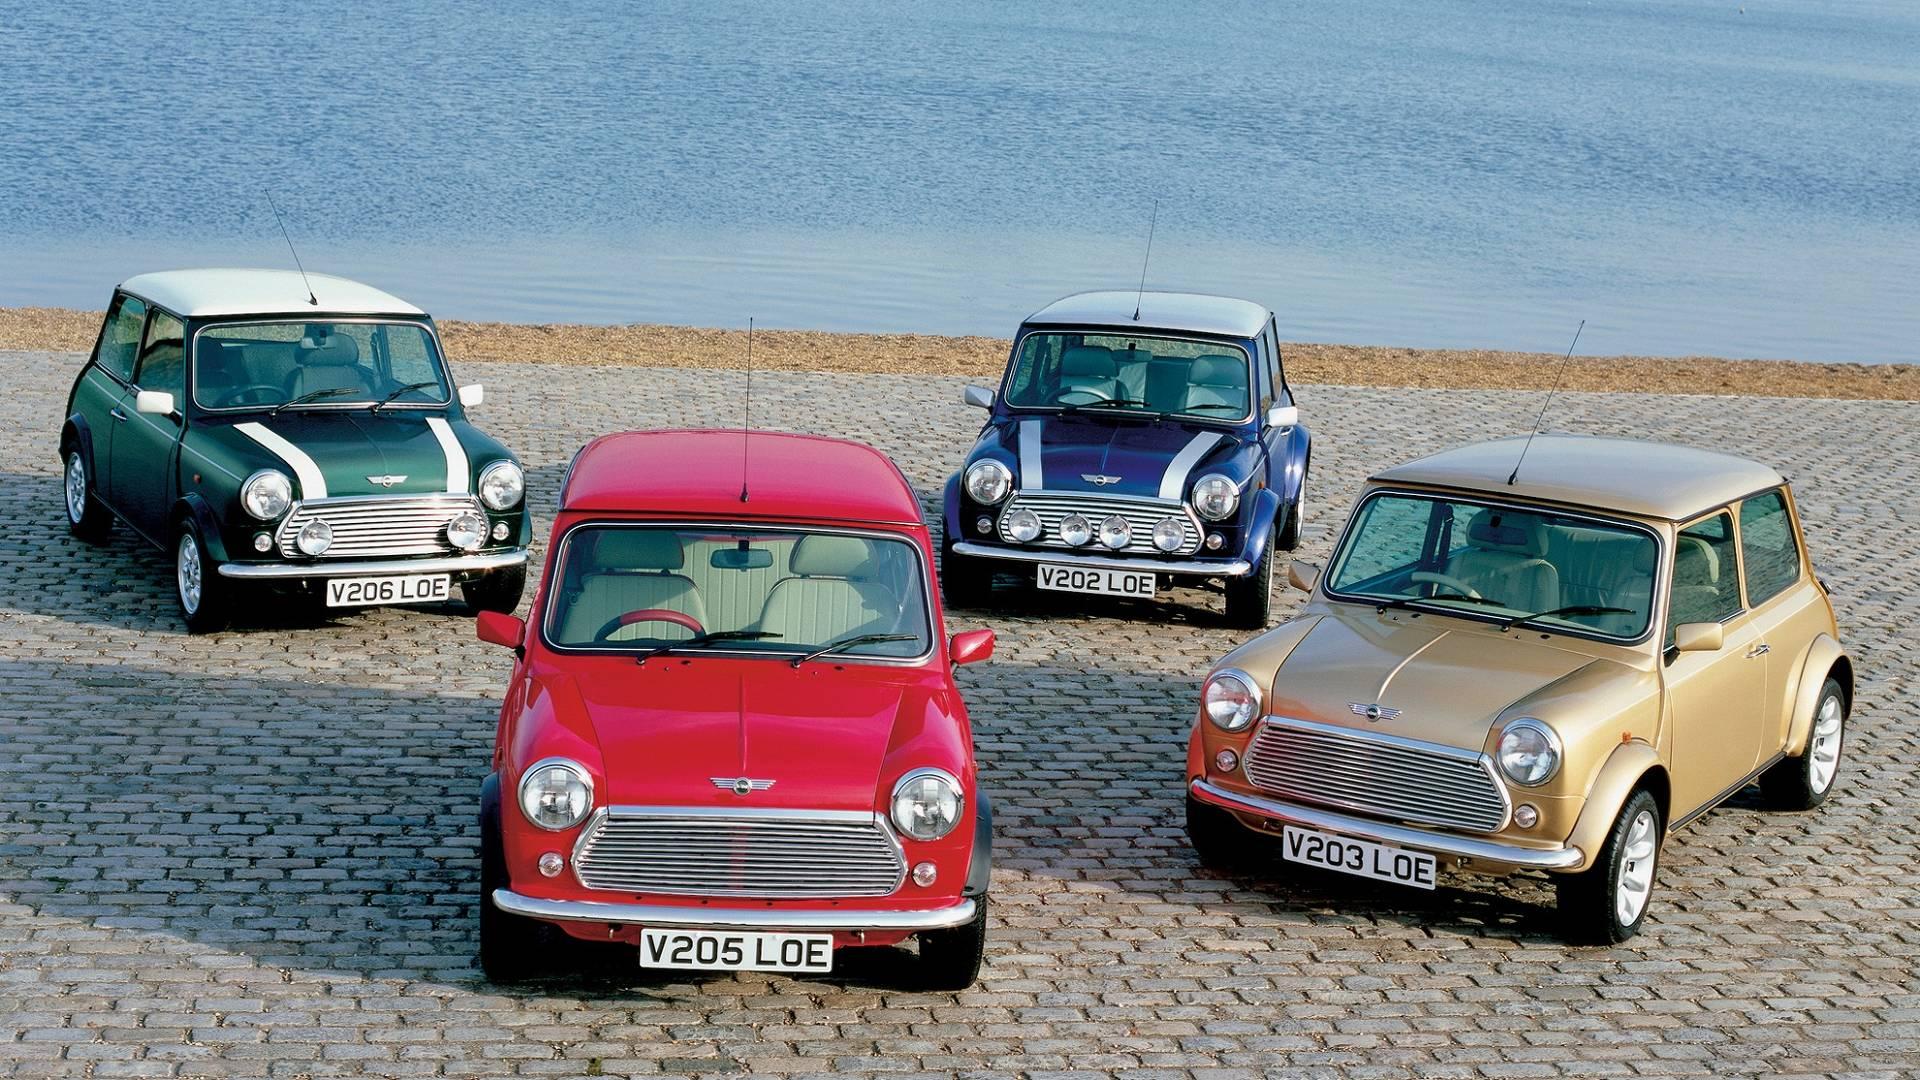 5a9414c18d827 classic mini through the years چرا ما کلاسیک مینی را دوست داریم   اجاره ماشین